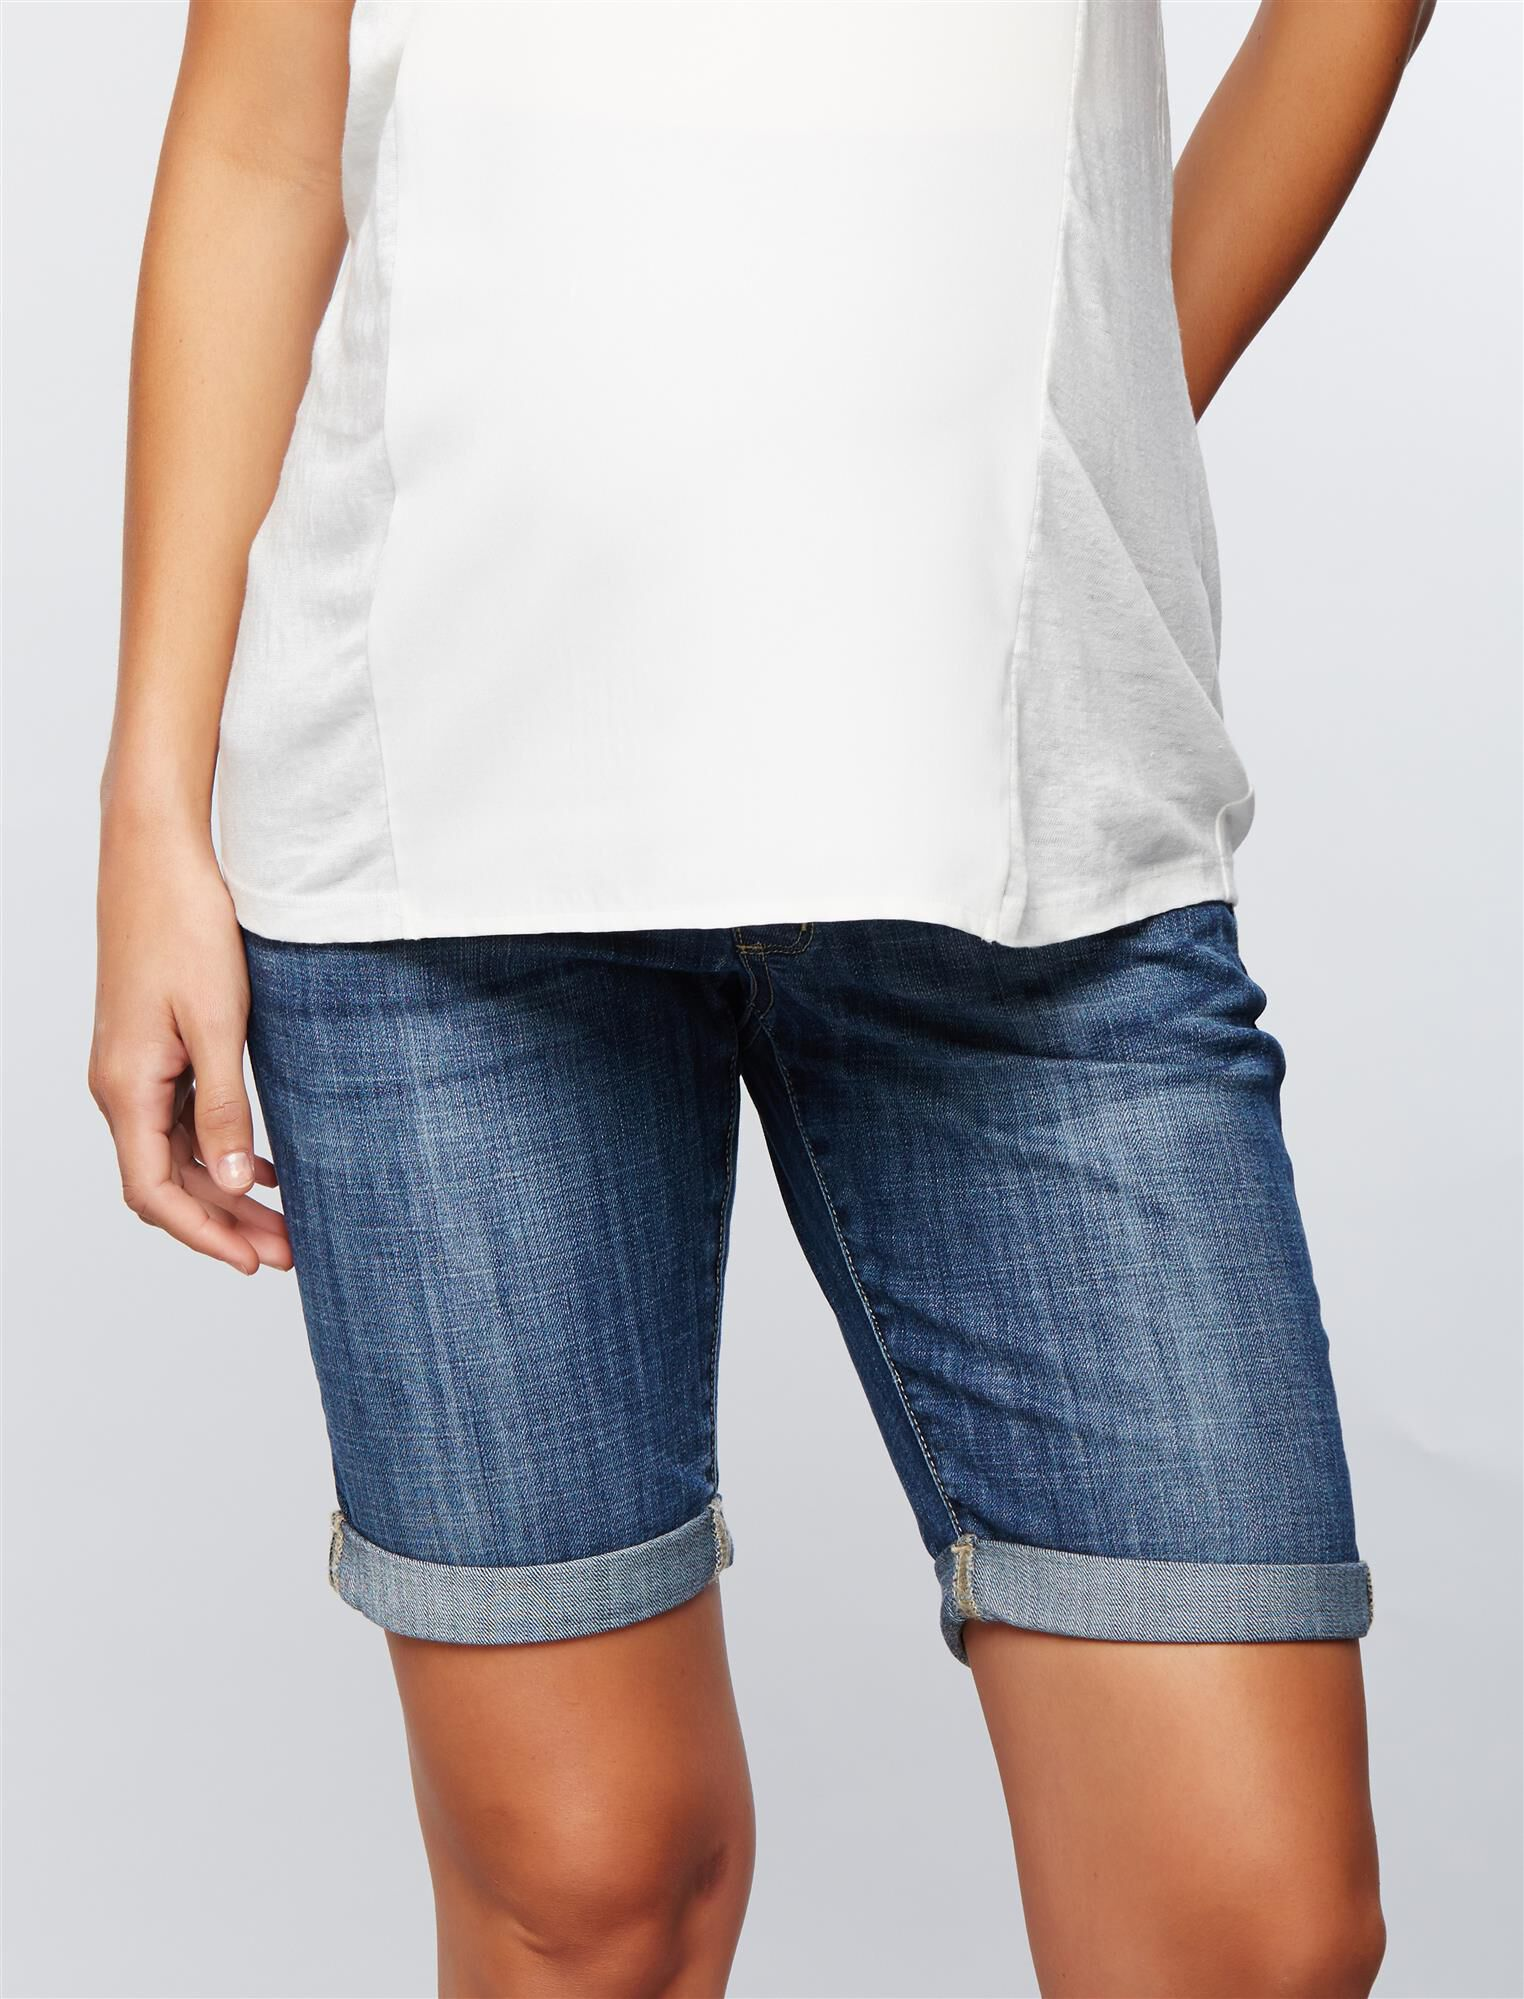 Luxe Essentials Denim Secret Fit Belly Maternity Bermuda Shorts